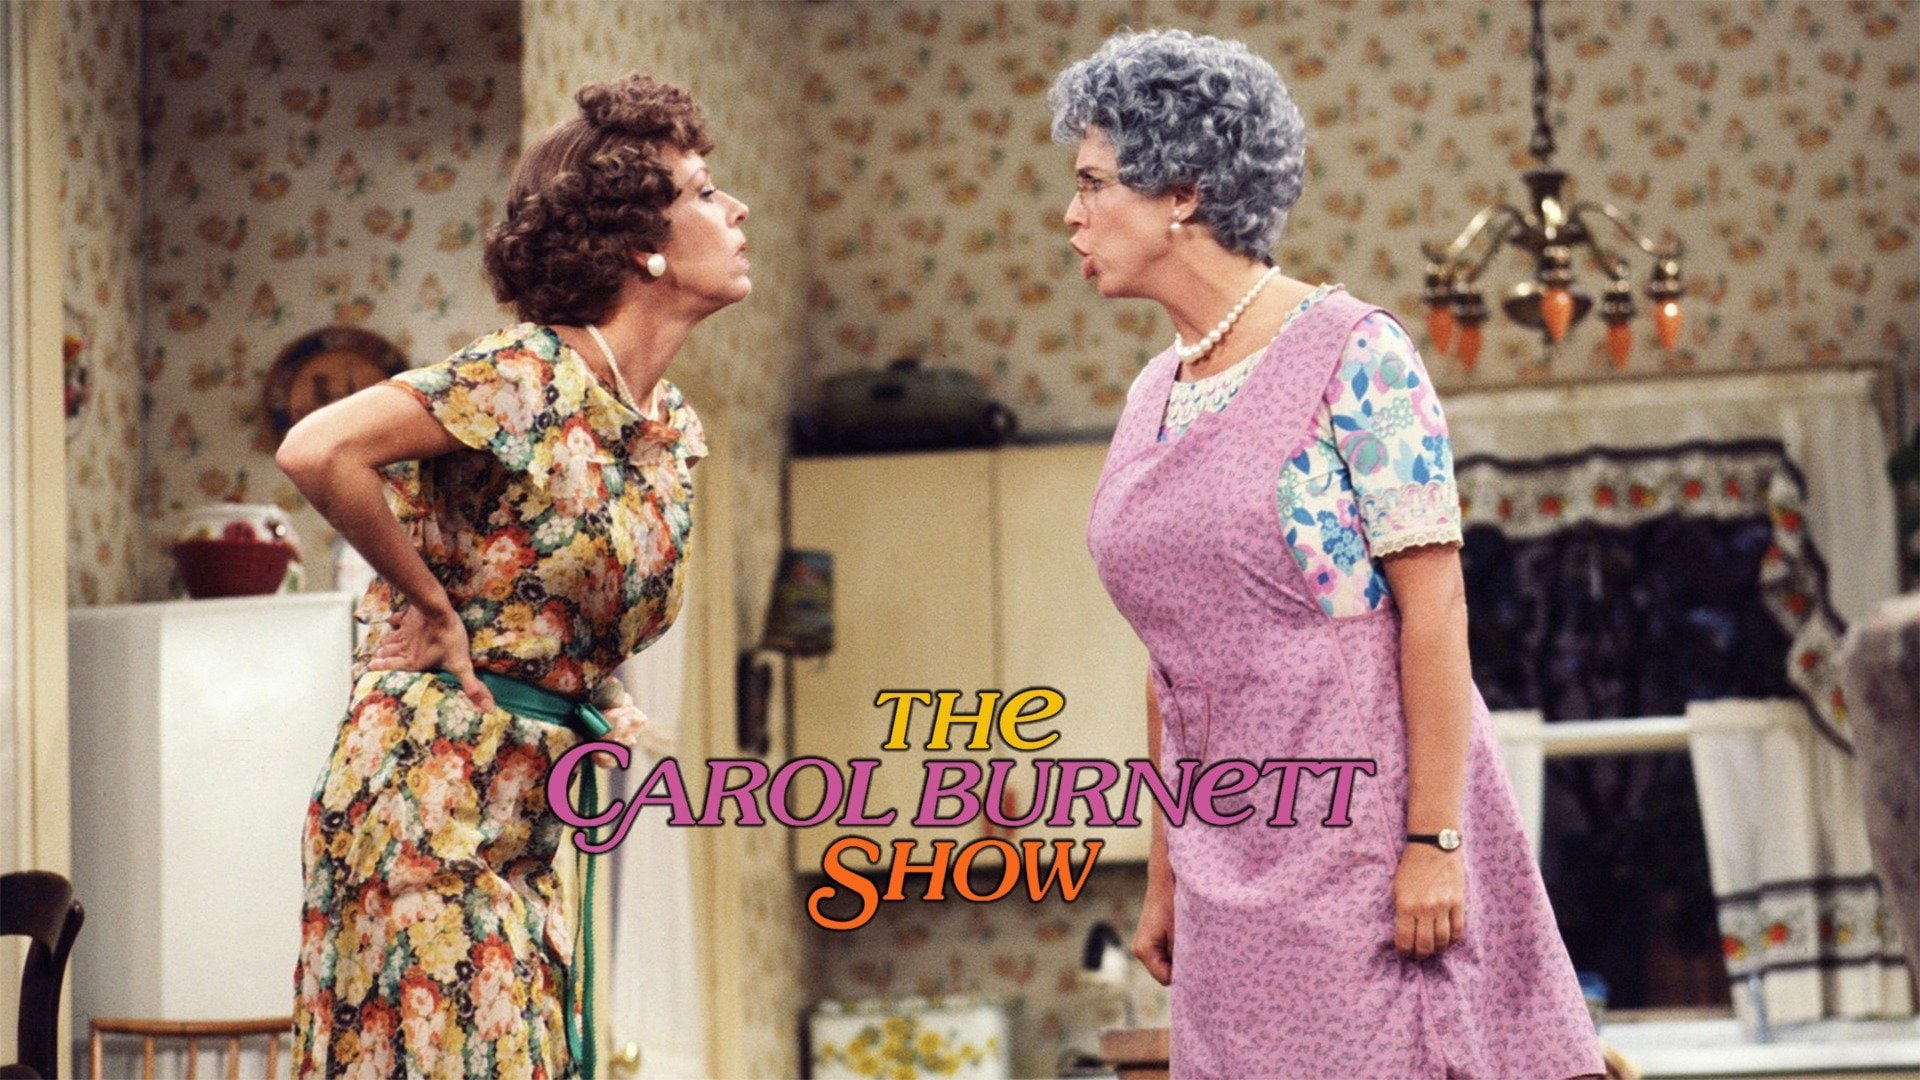 The Carol Burnett Show: Andy Griffith